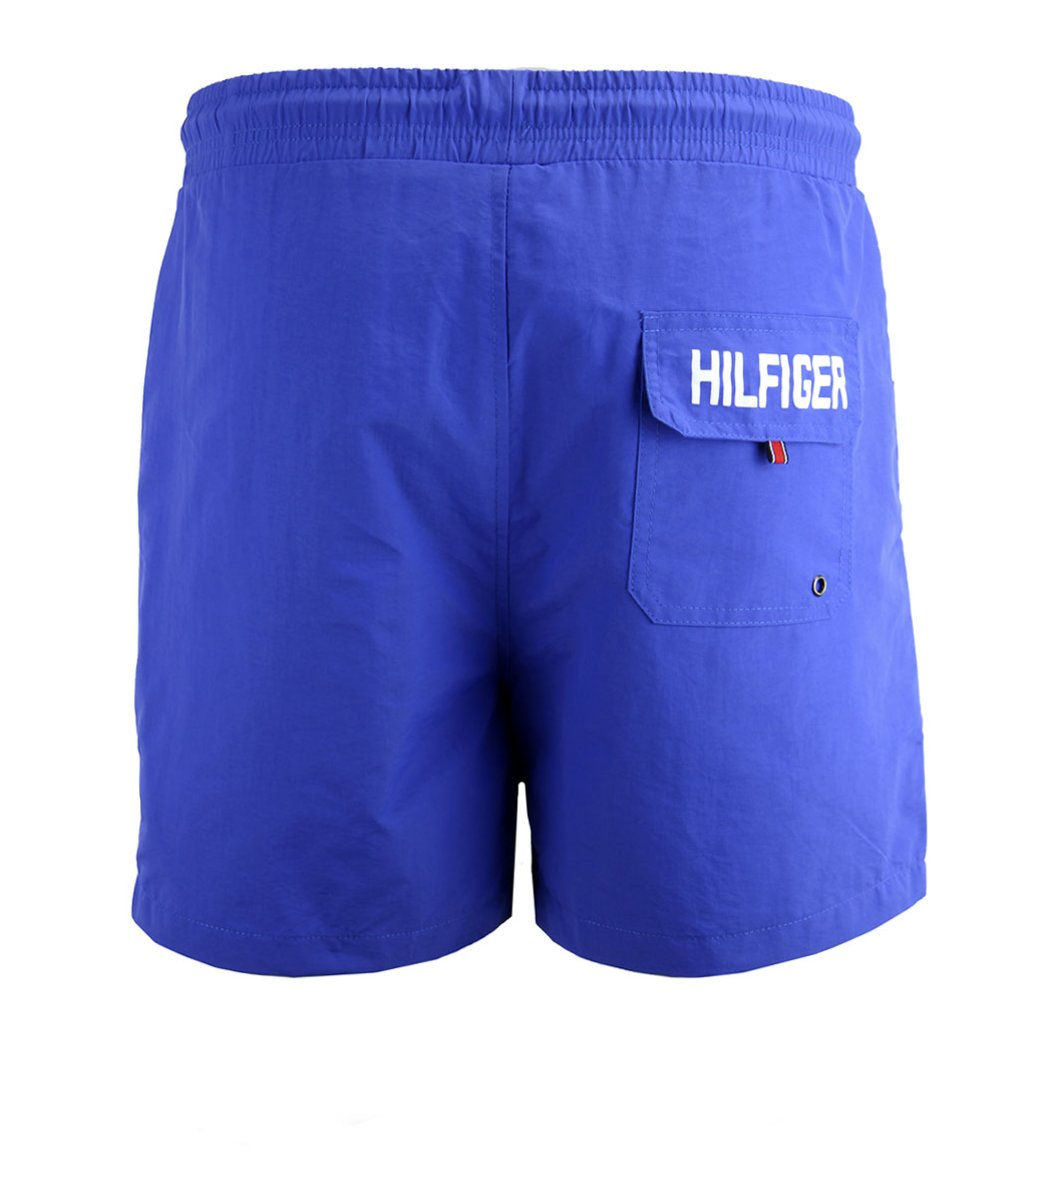 Синие шорты Tommy Hilfiger Dolphin 2 с карманом